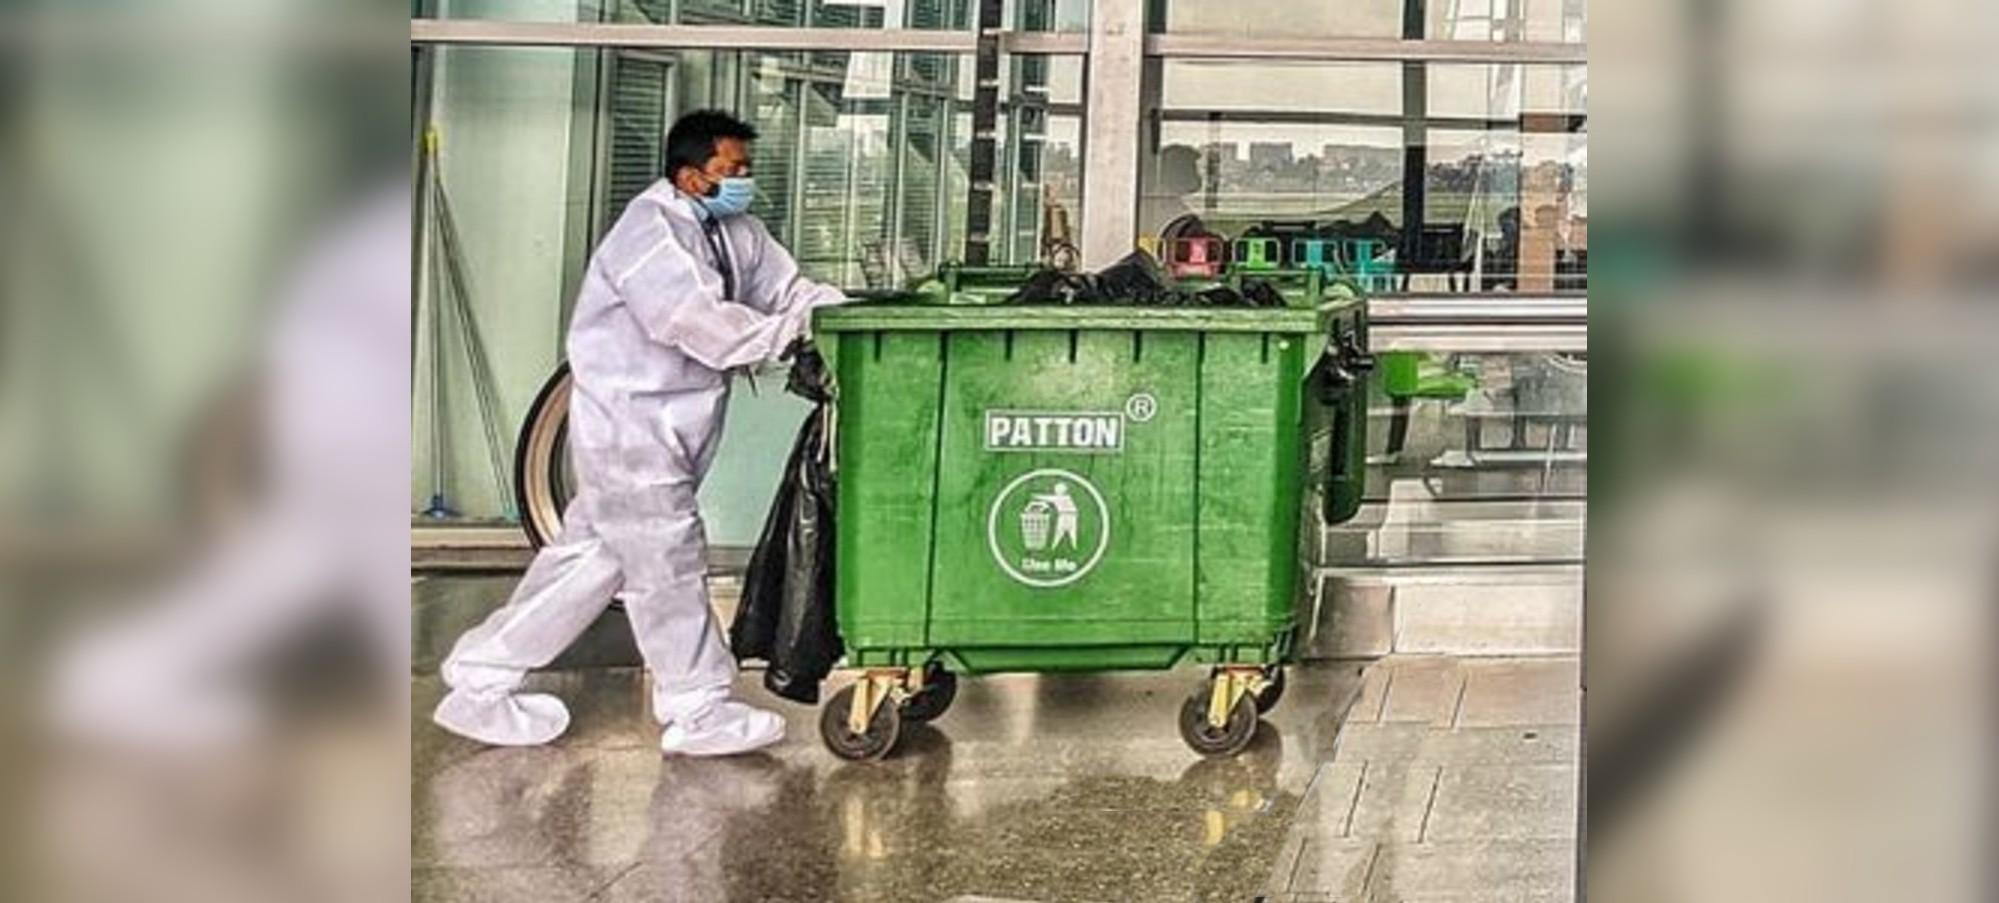 Patton Industrial Waste Bin in use at the Netaji Subhash Chandra Bose International Airport, Kolkata